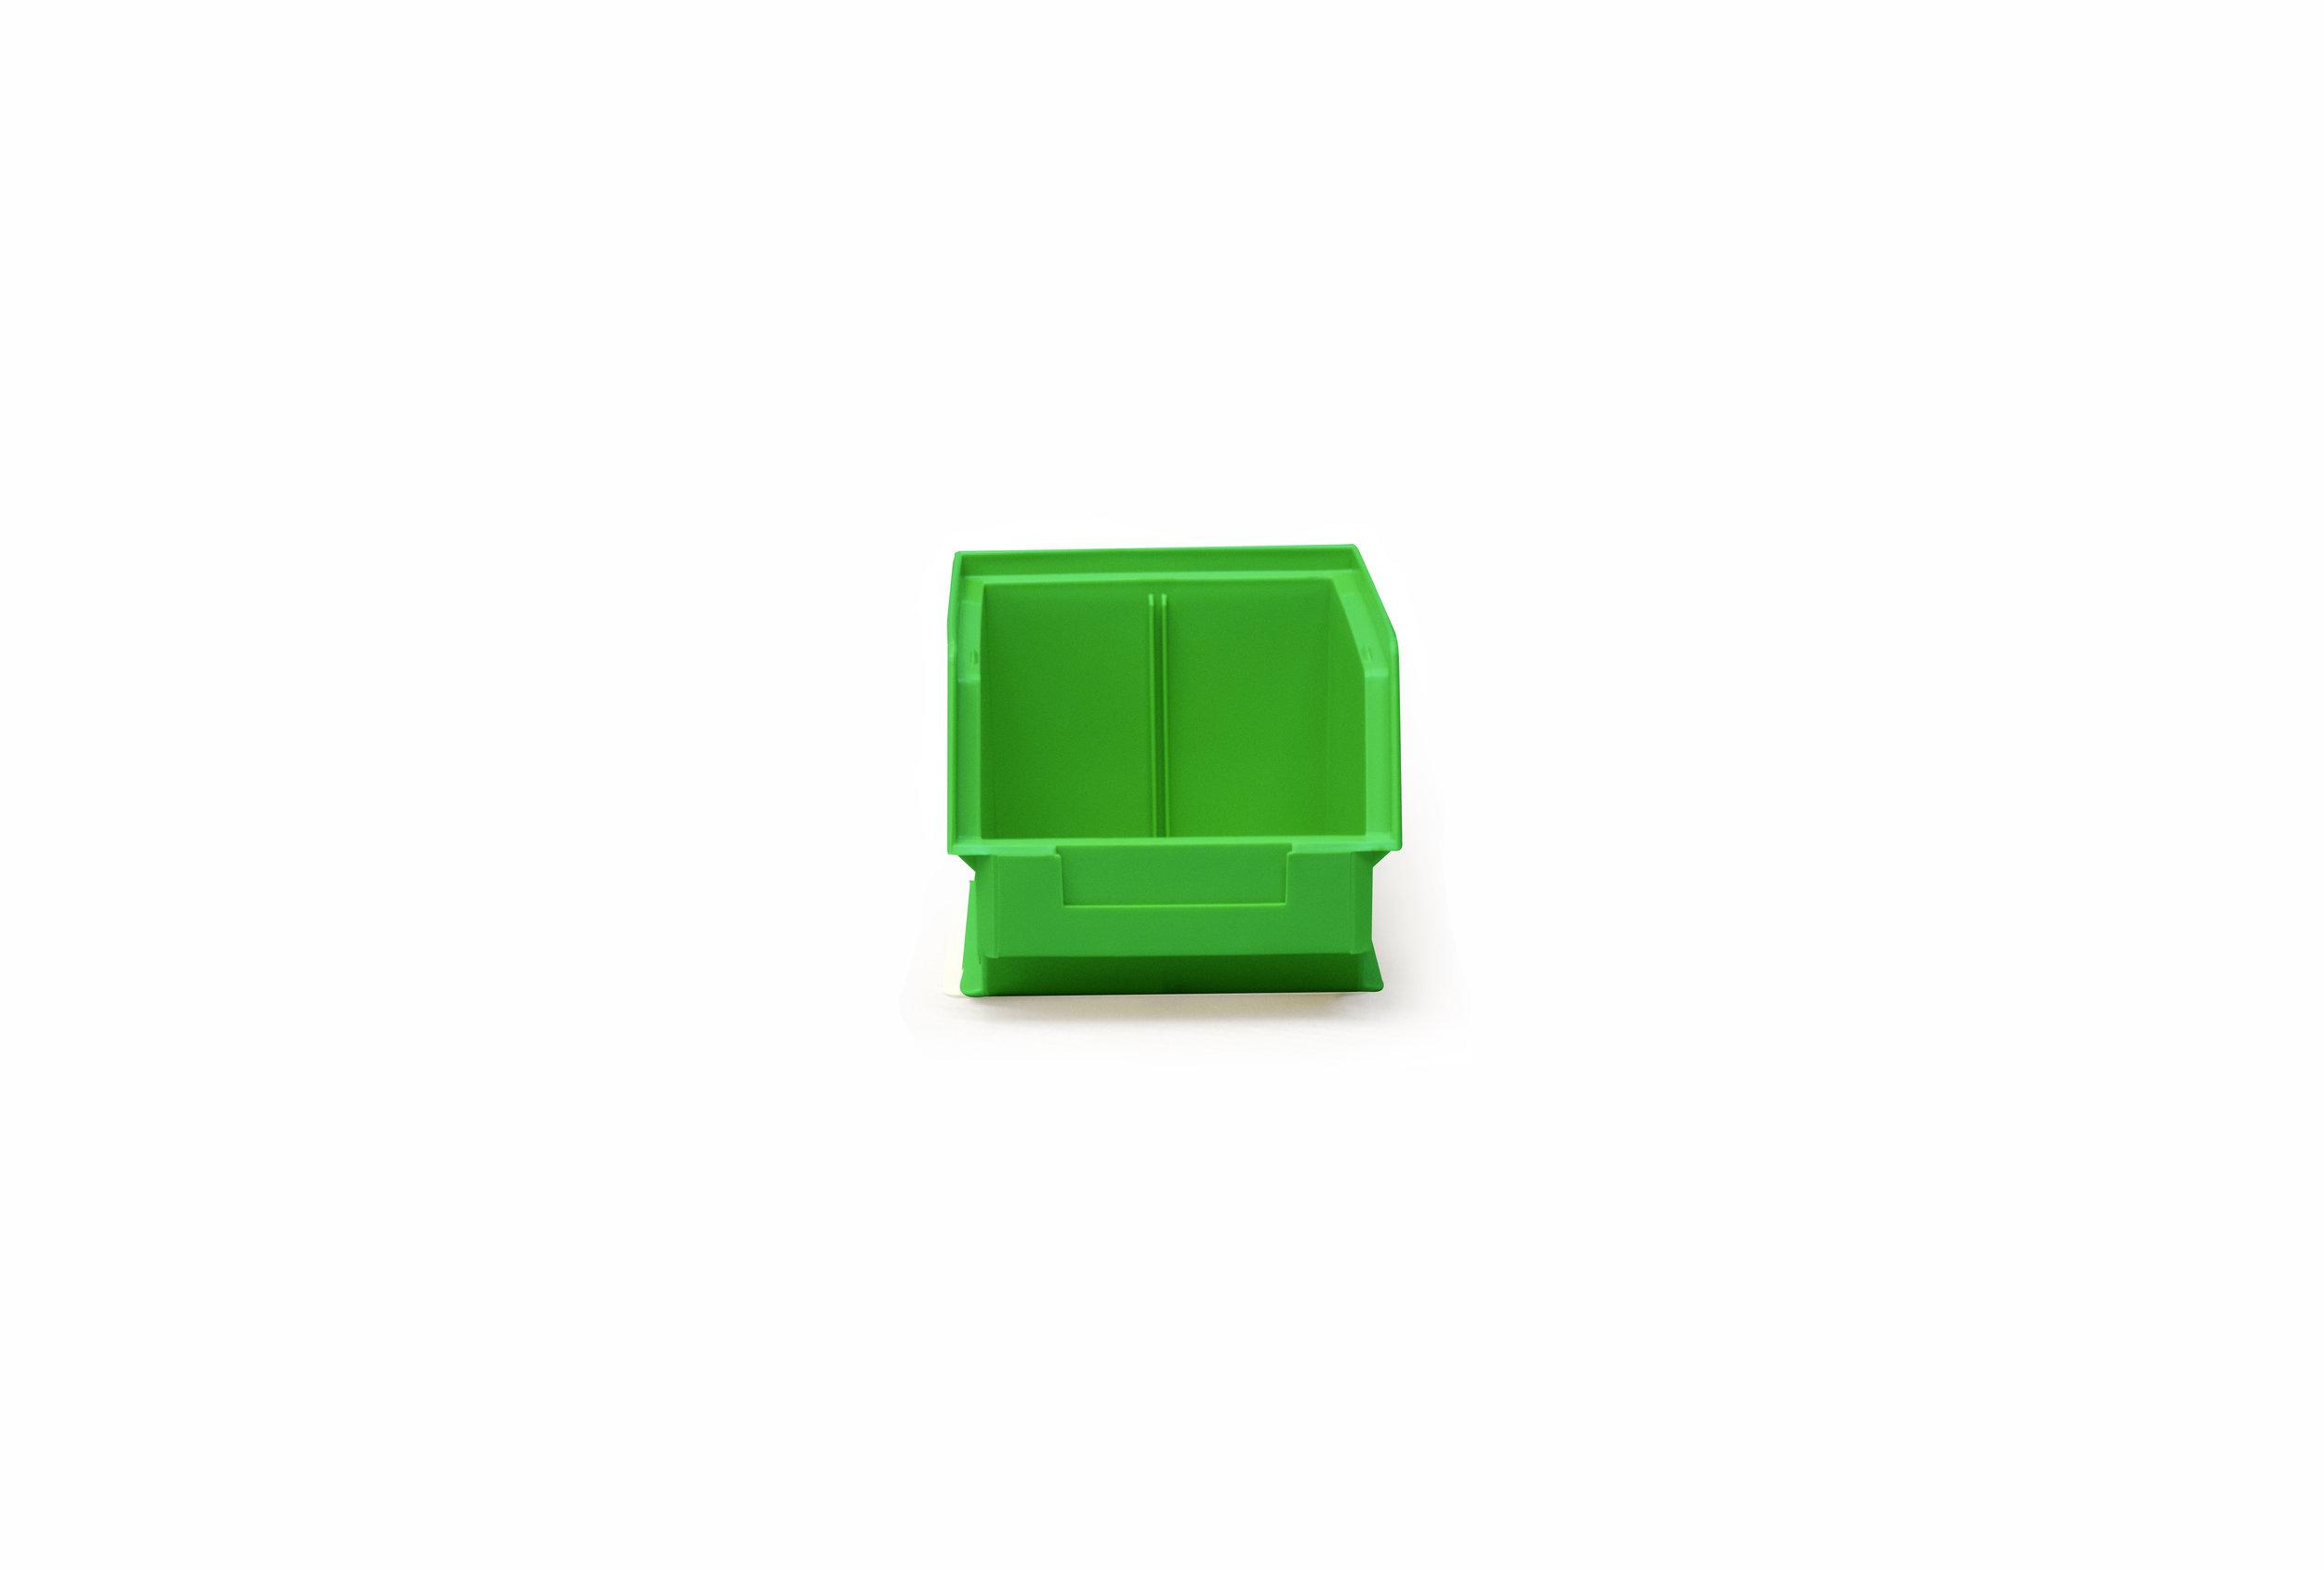 Size 4 Green (Image 2).jpg